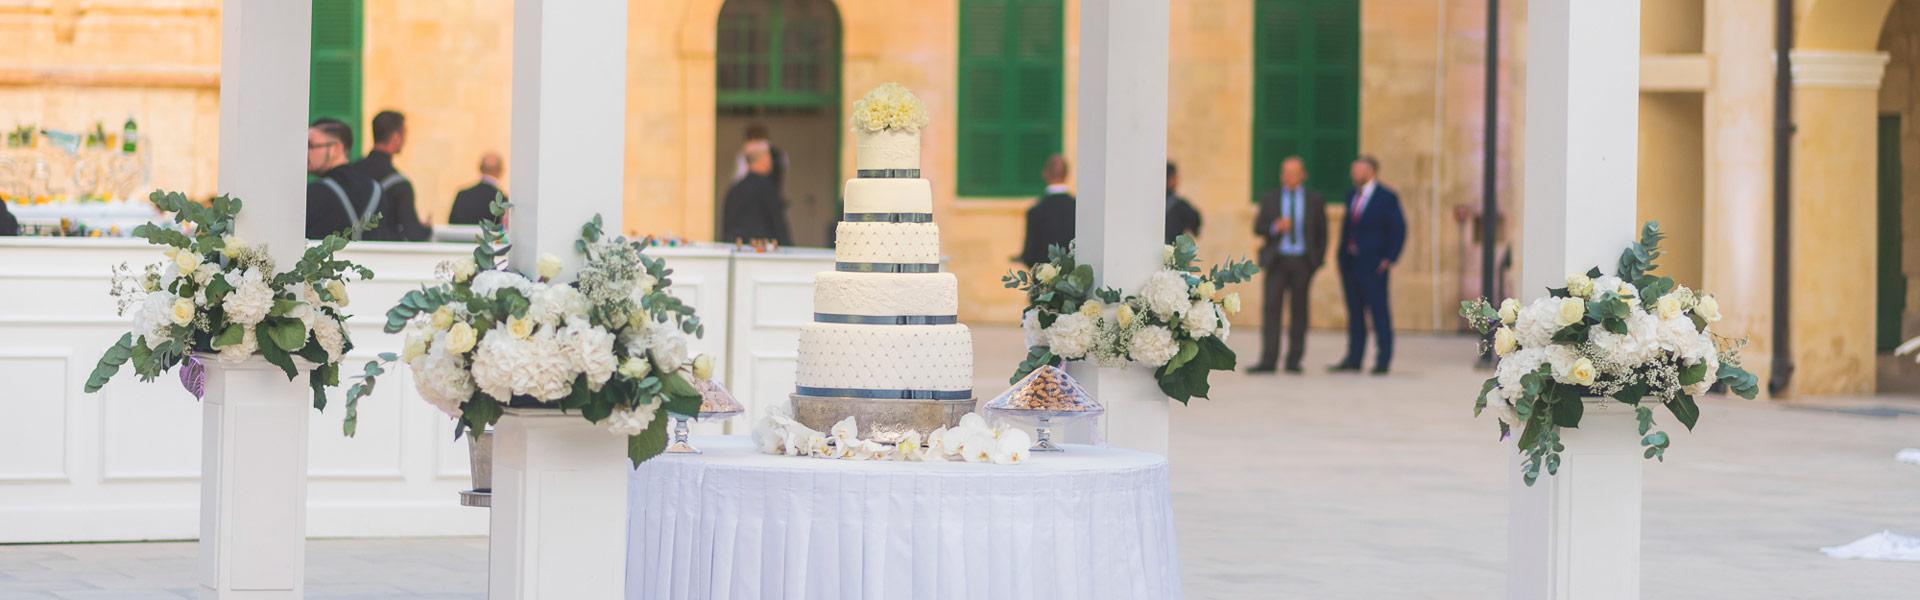 Weddings Banner